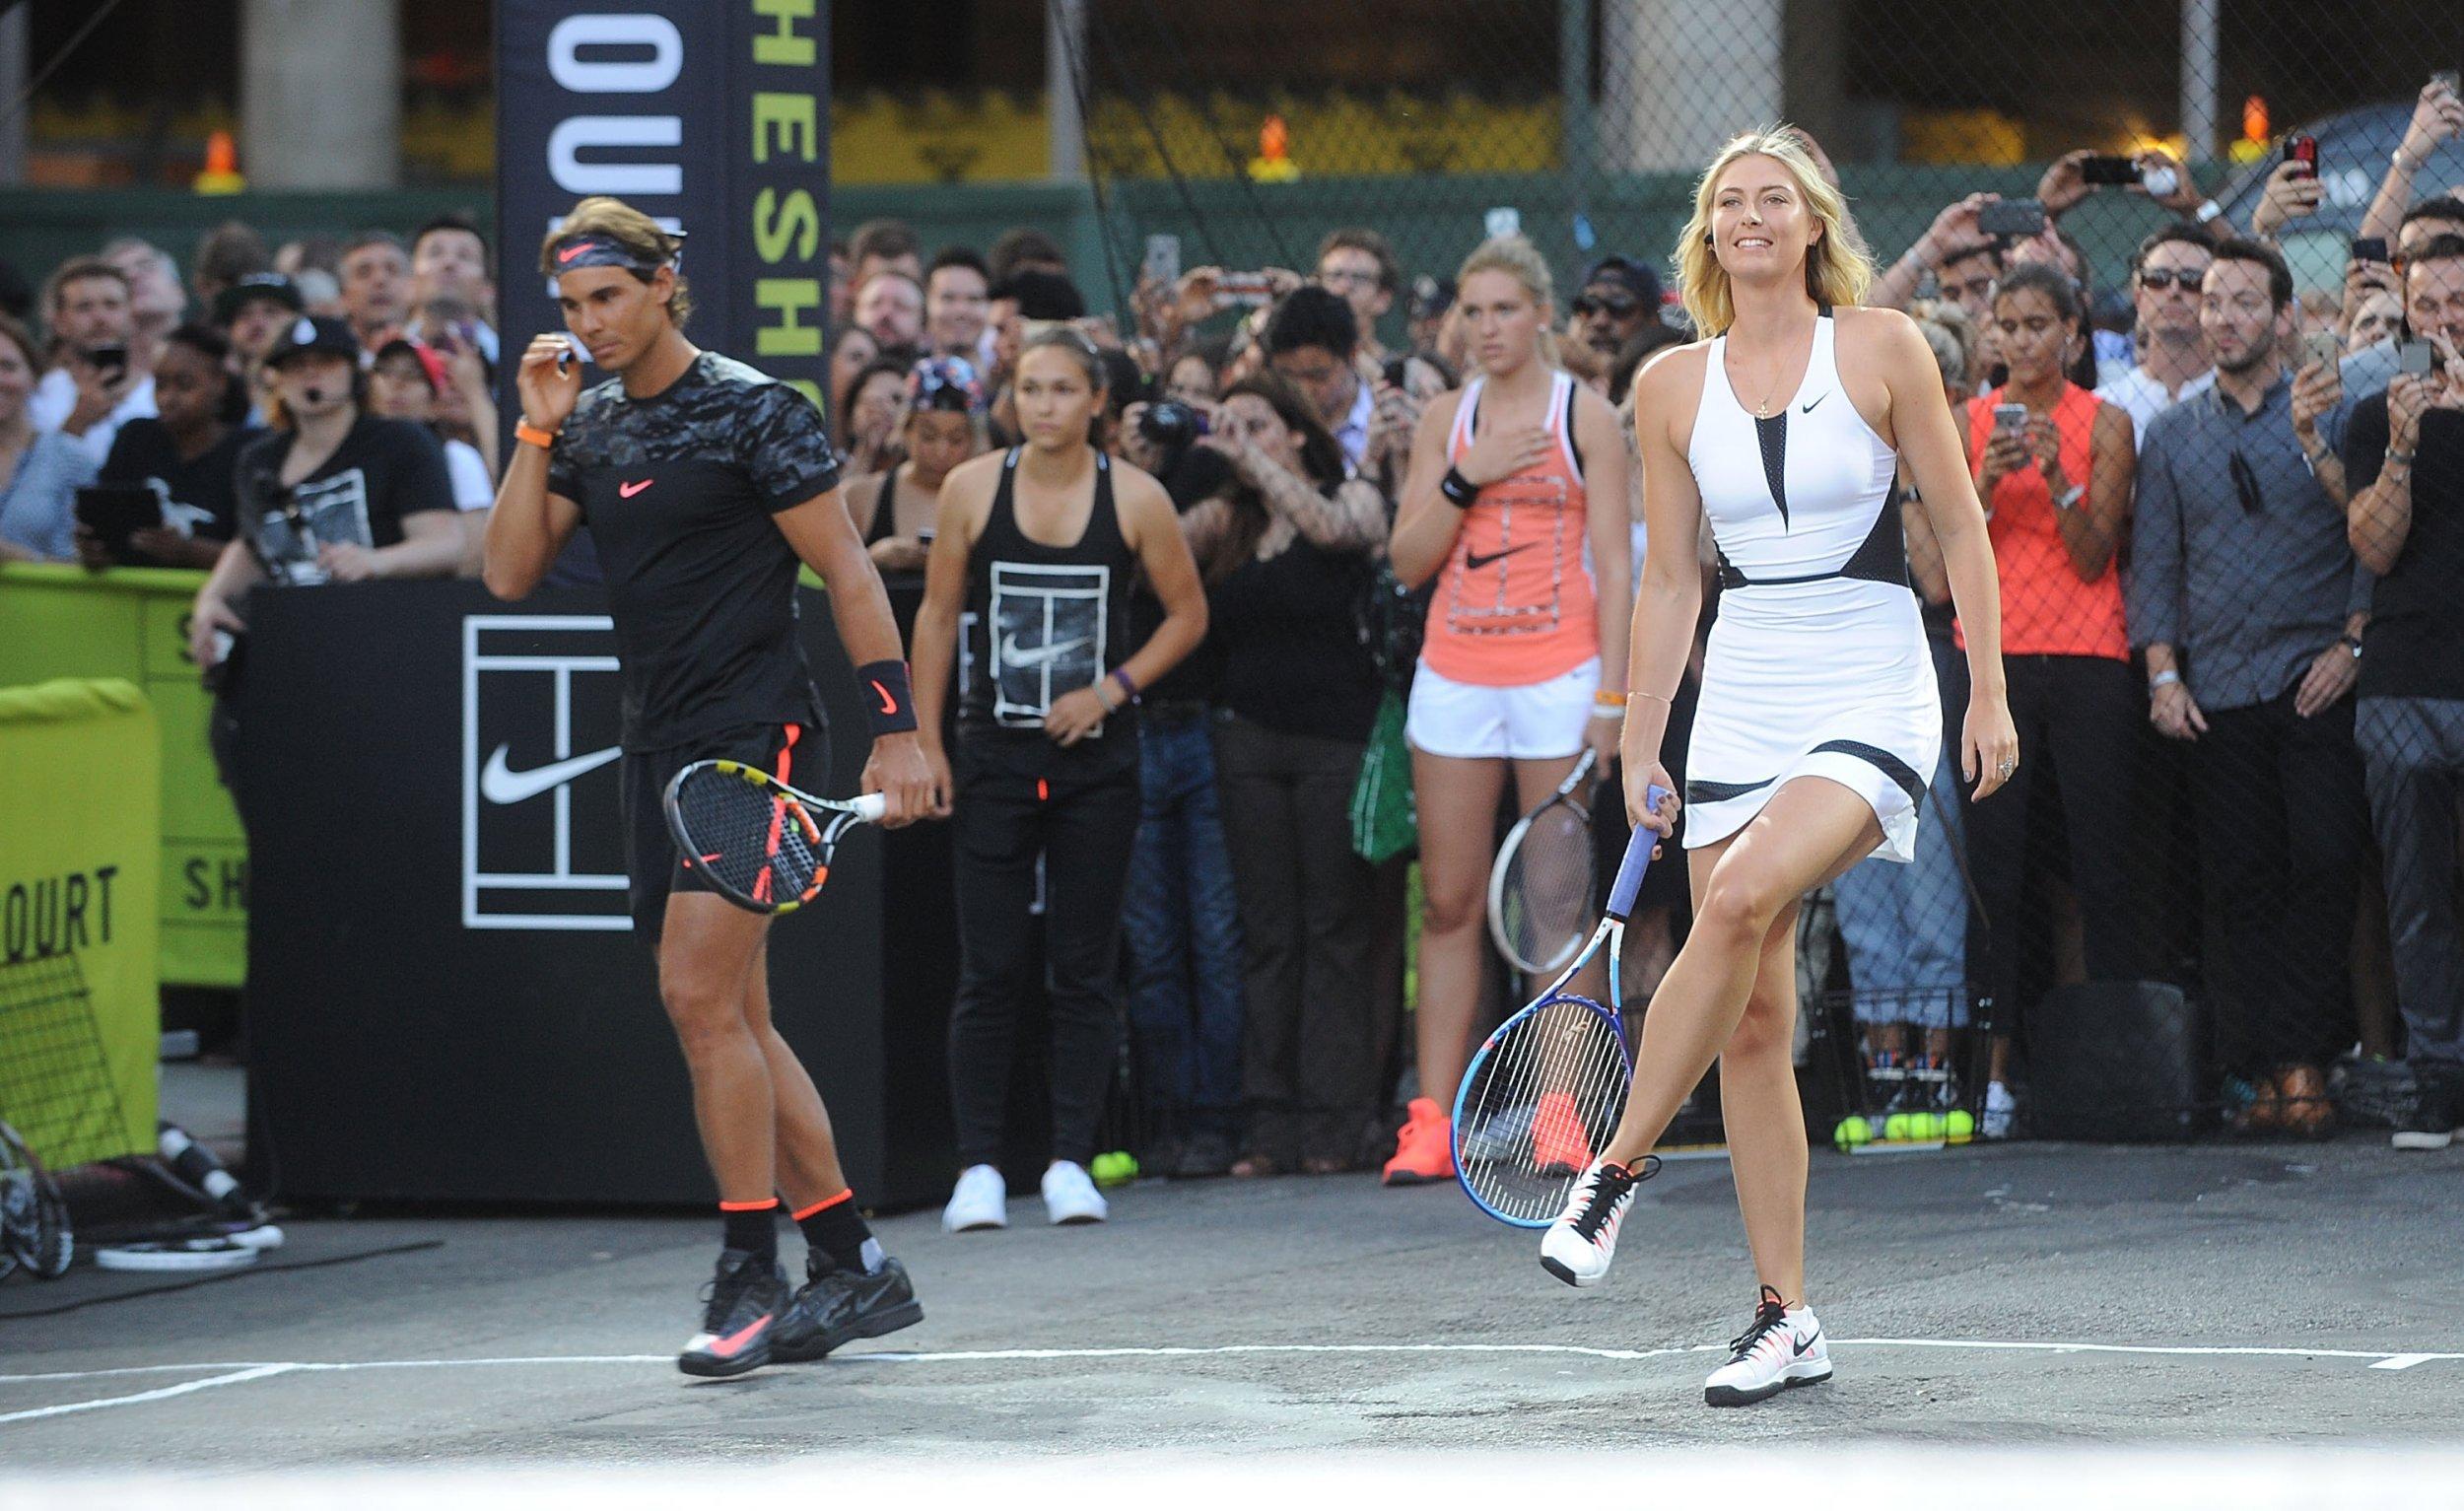 Rafael Nadal, left, believes Maria Sharapova should be 'punished' for her Meldonium positive drugs test.